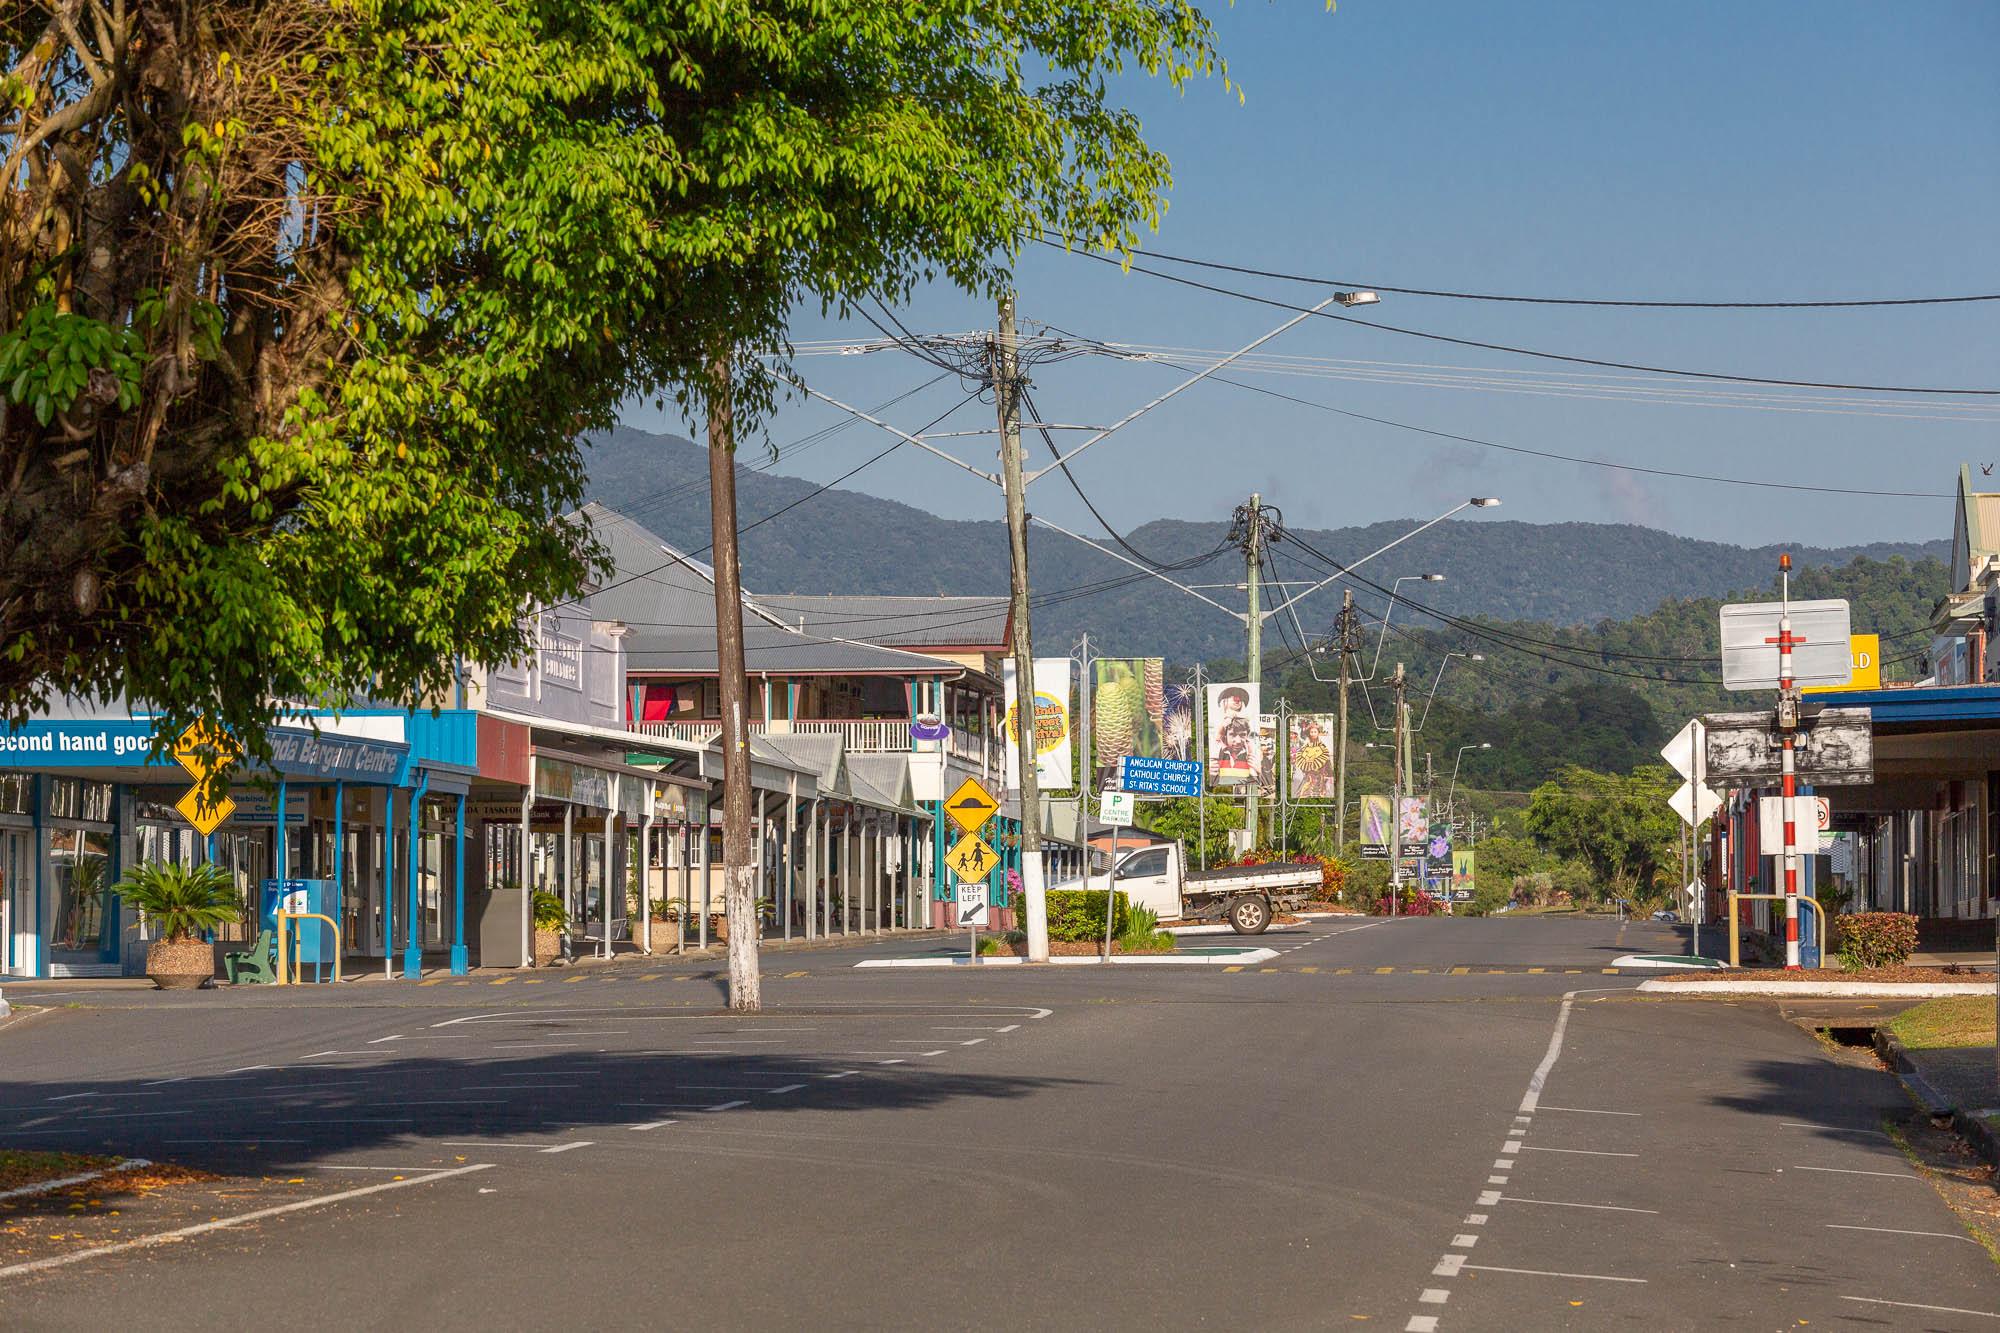 Babinda town center